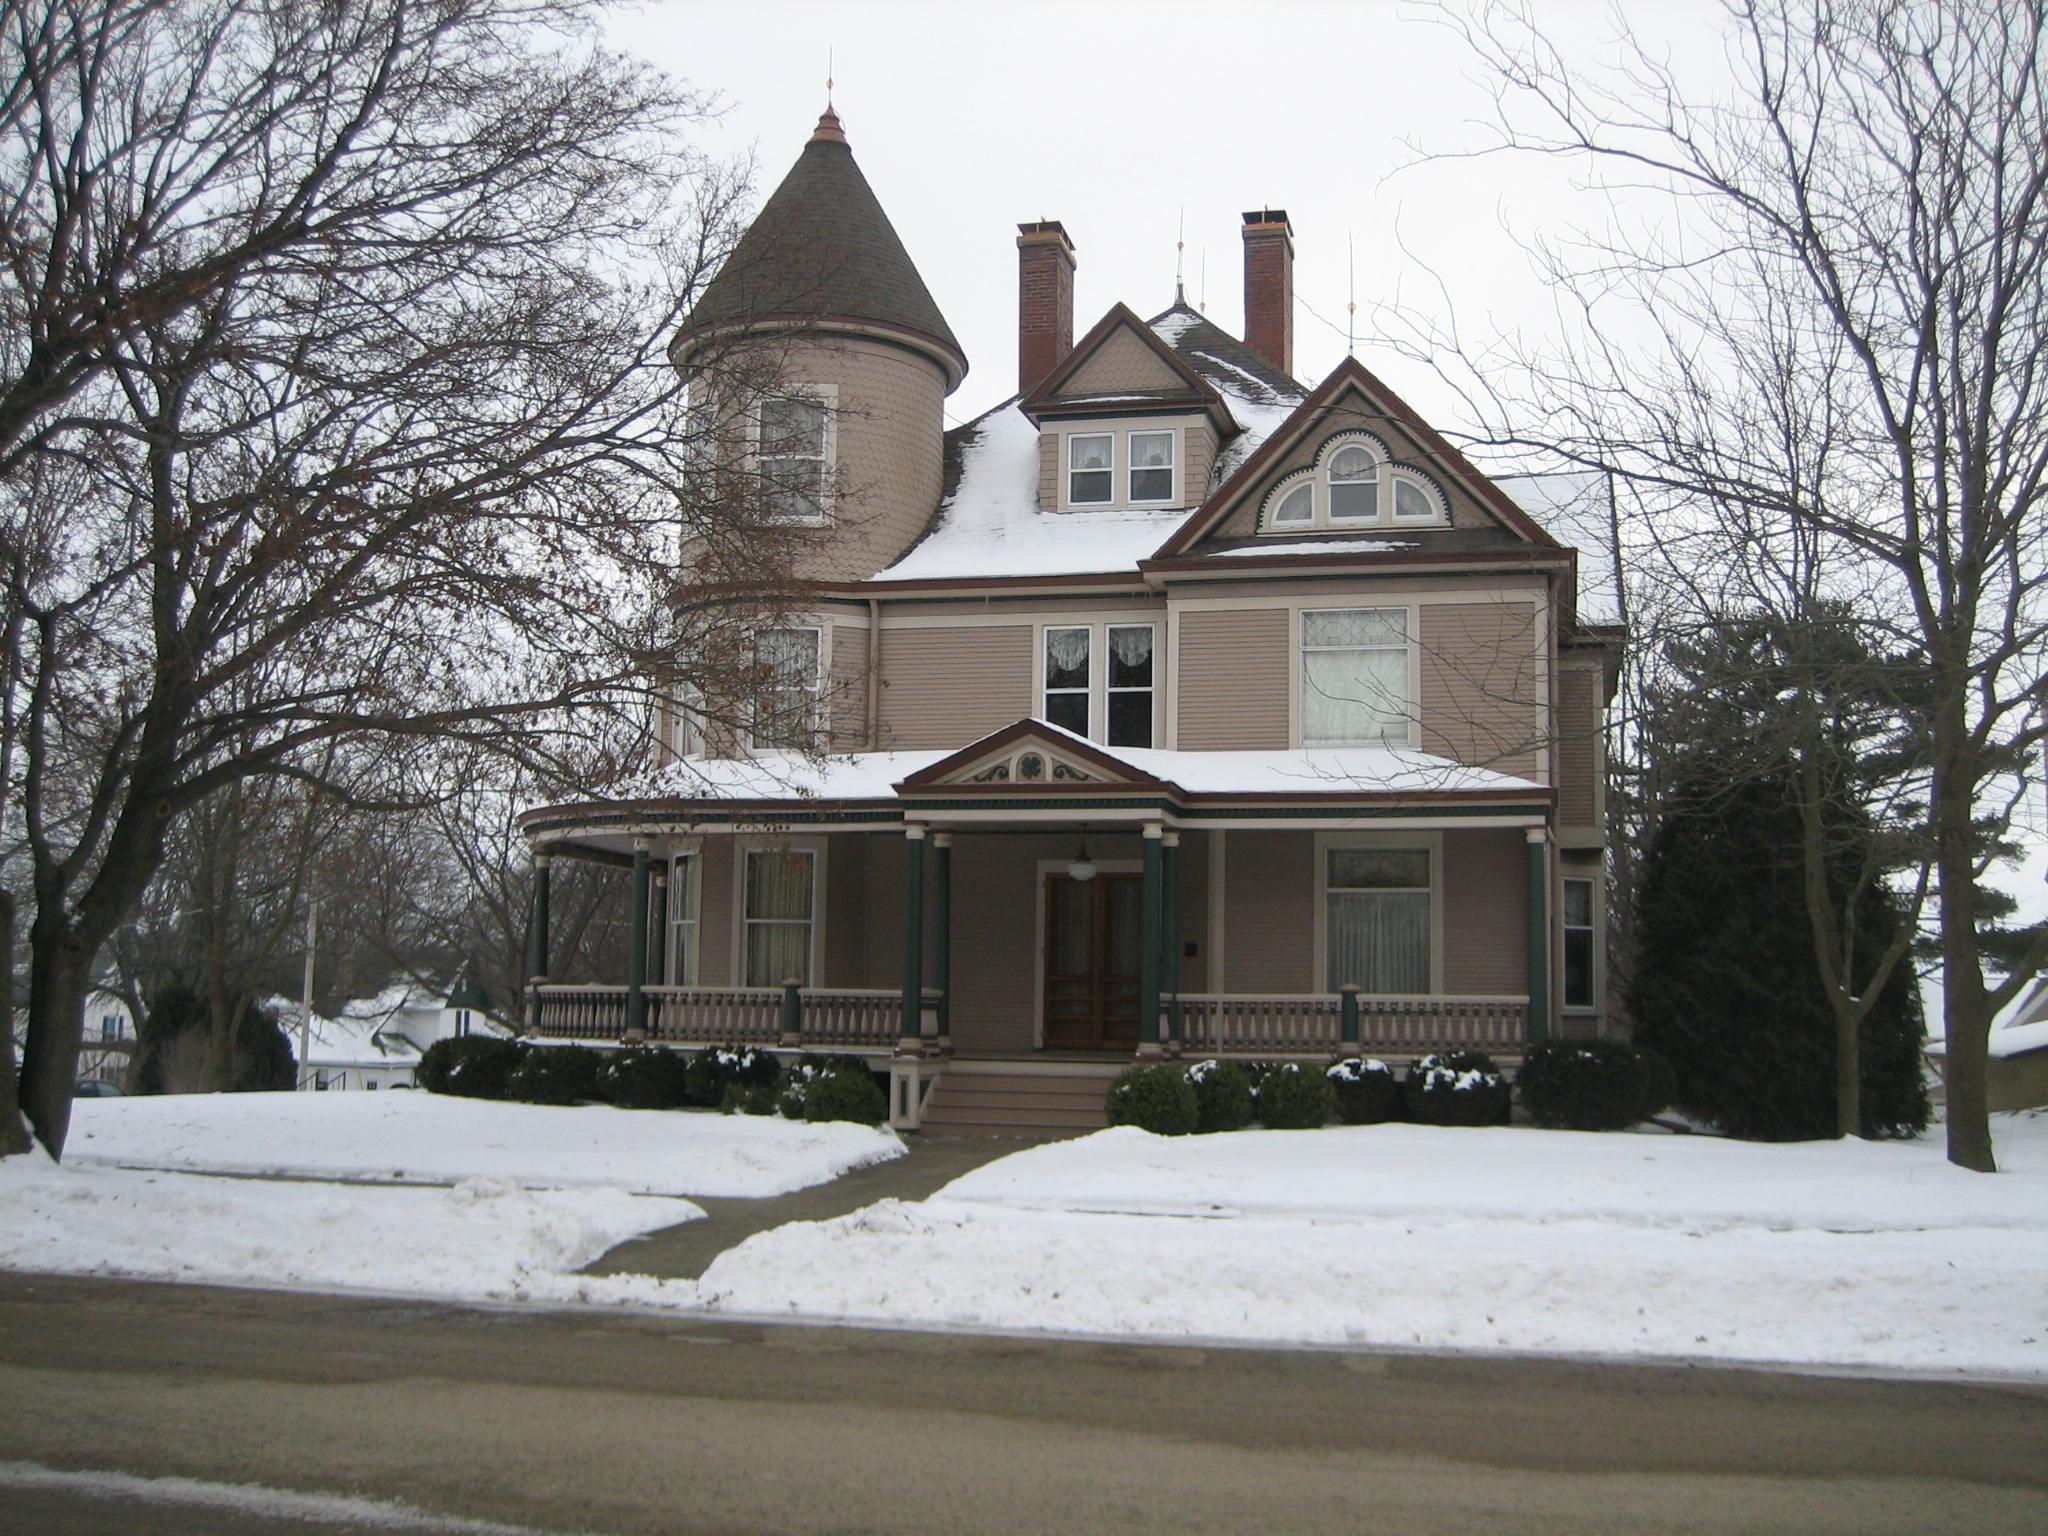 Illinois ogle county polo - File Ogle County Polo Il Mcgrath House1 Jpg